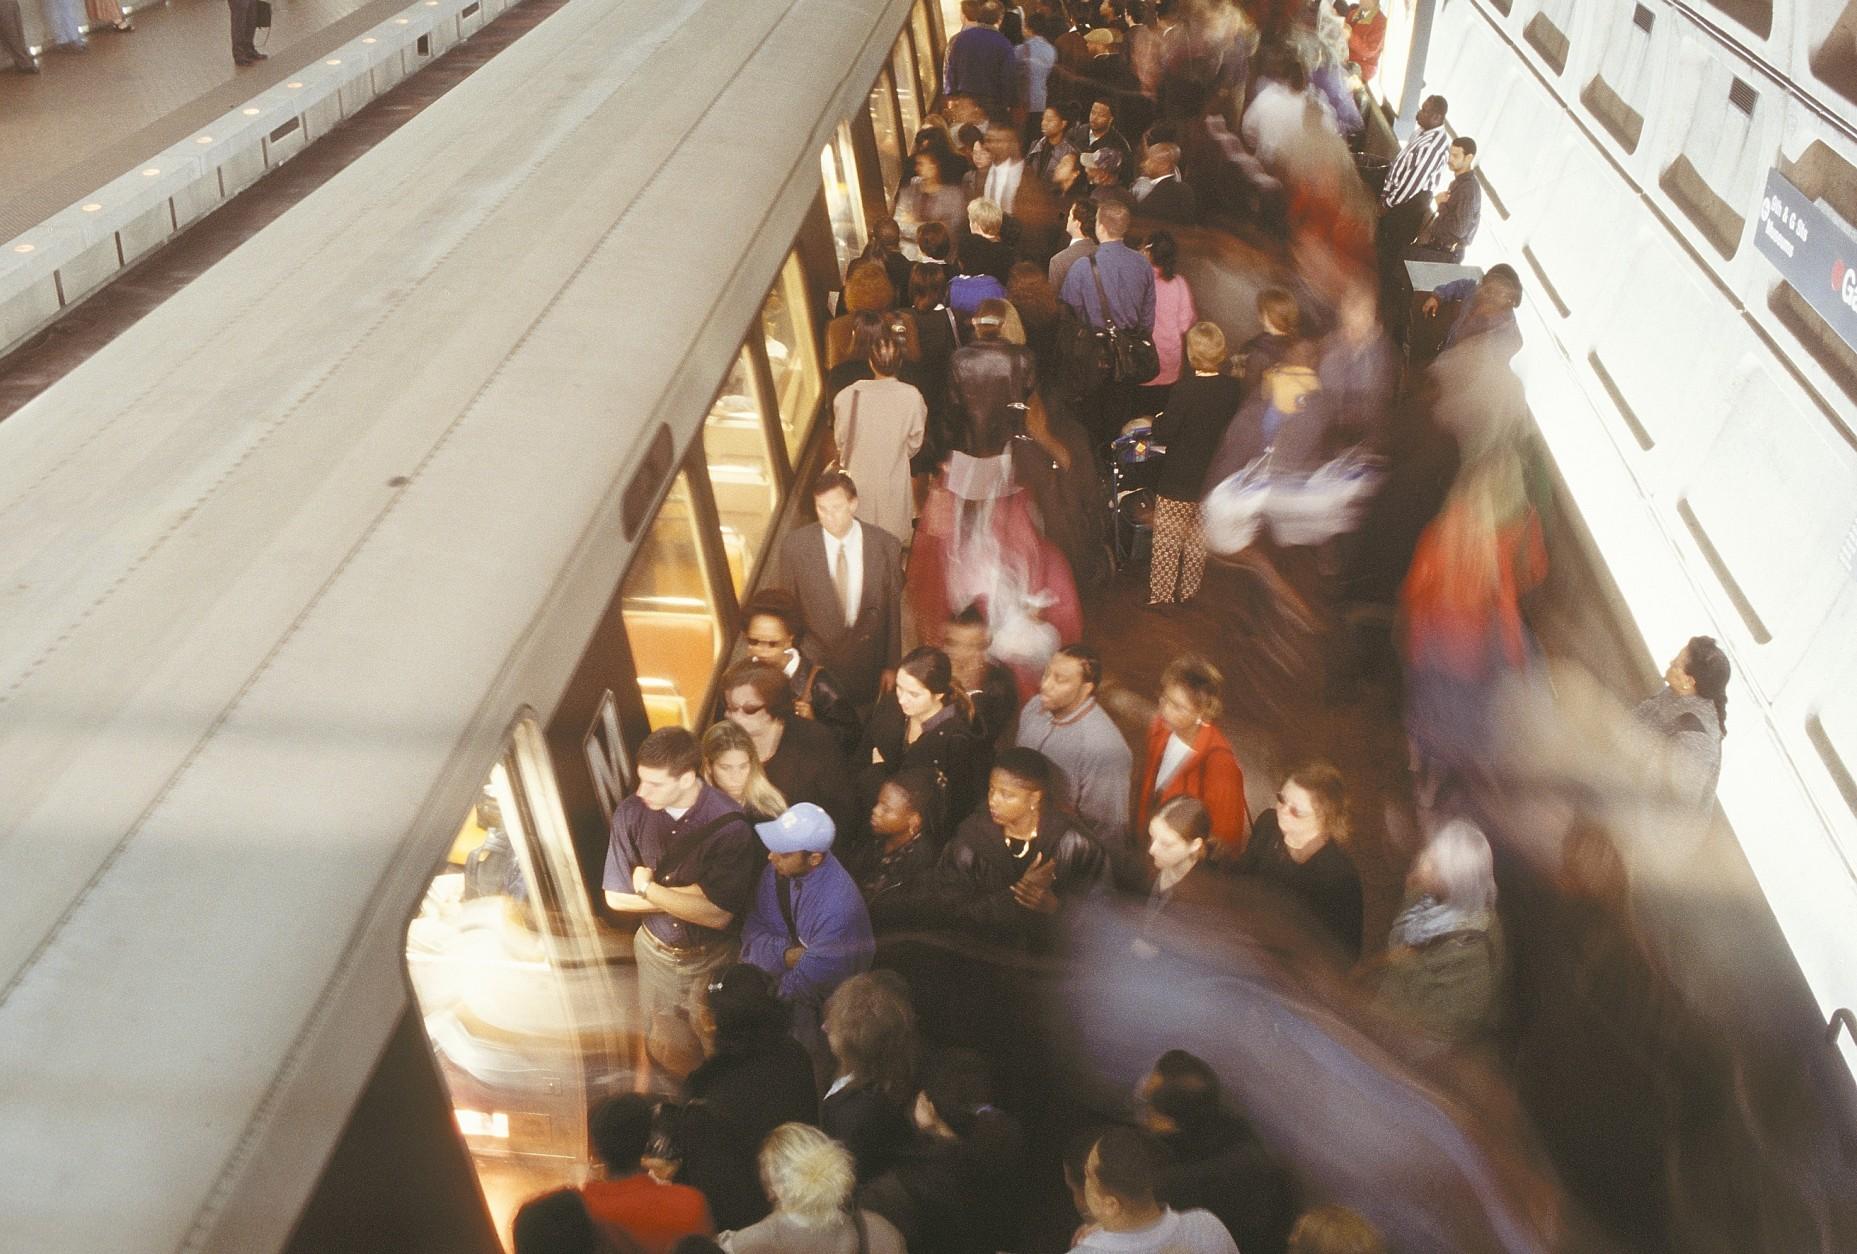 Metro GM announces management overhaul, potential for longer shutdowns